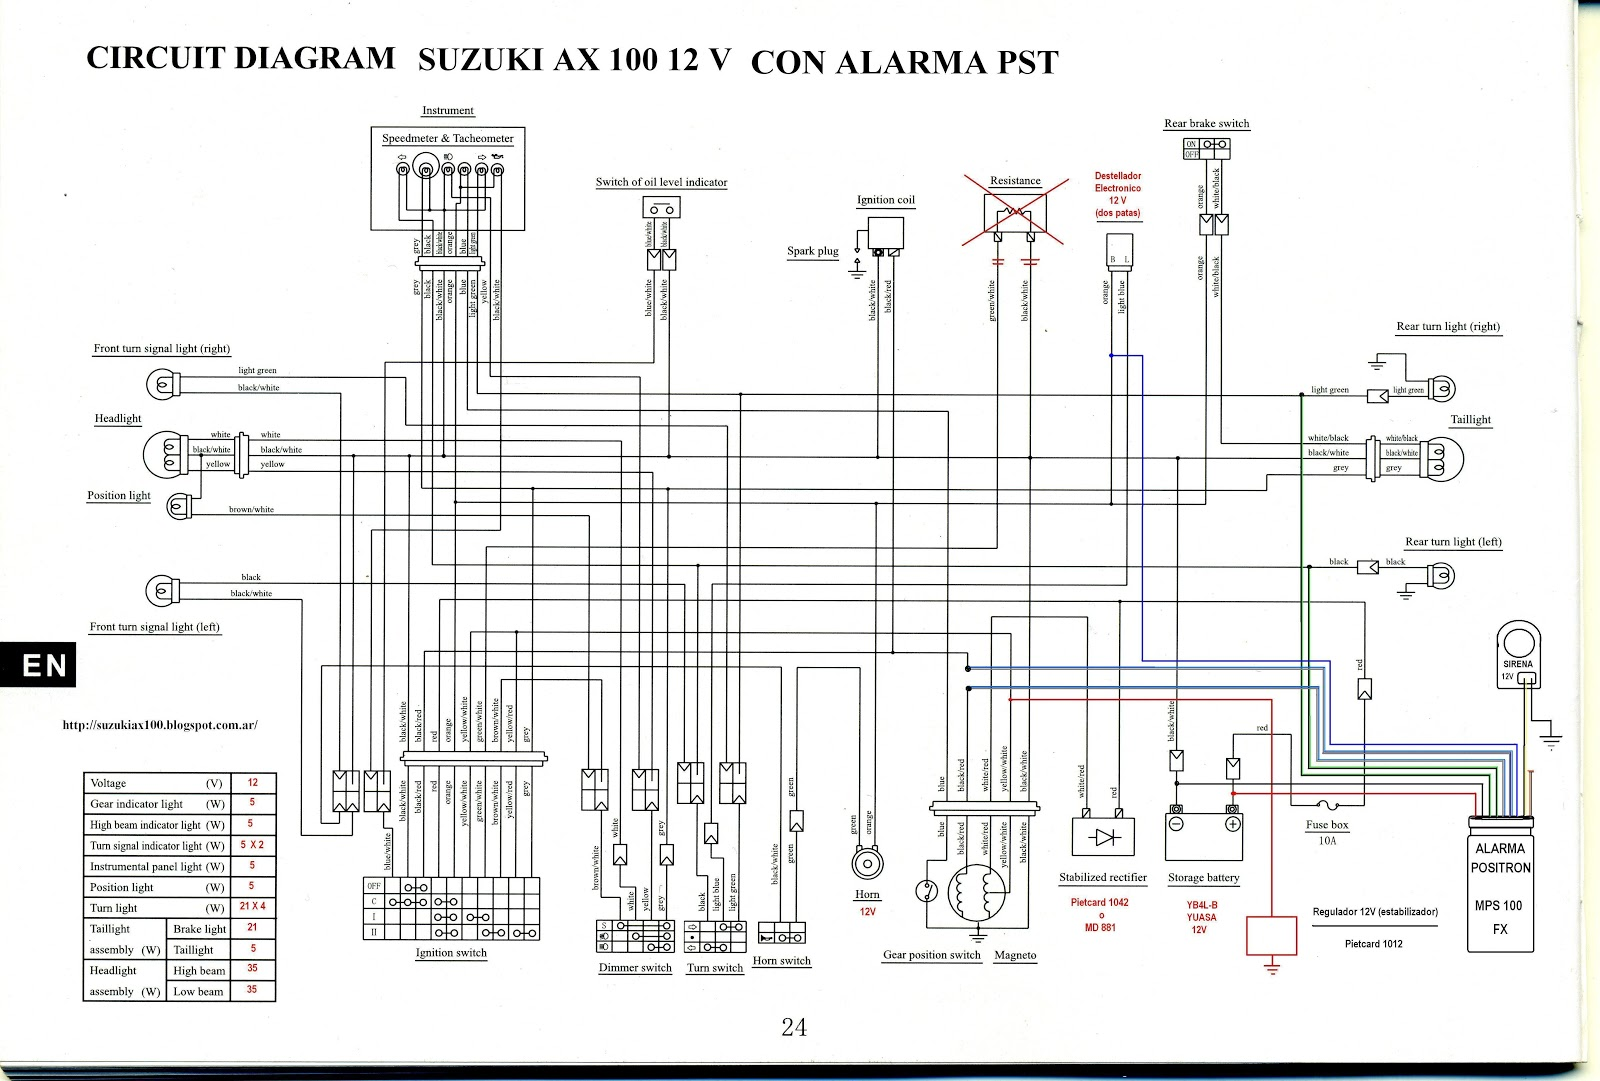 Suzuki Ax100 Pasion Por 2t Instalacion Alarma Pst Mps100